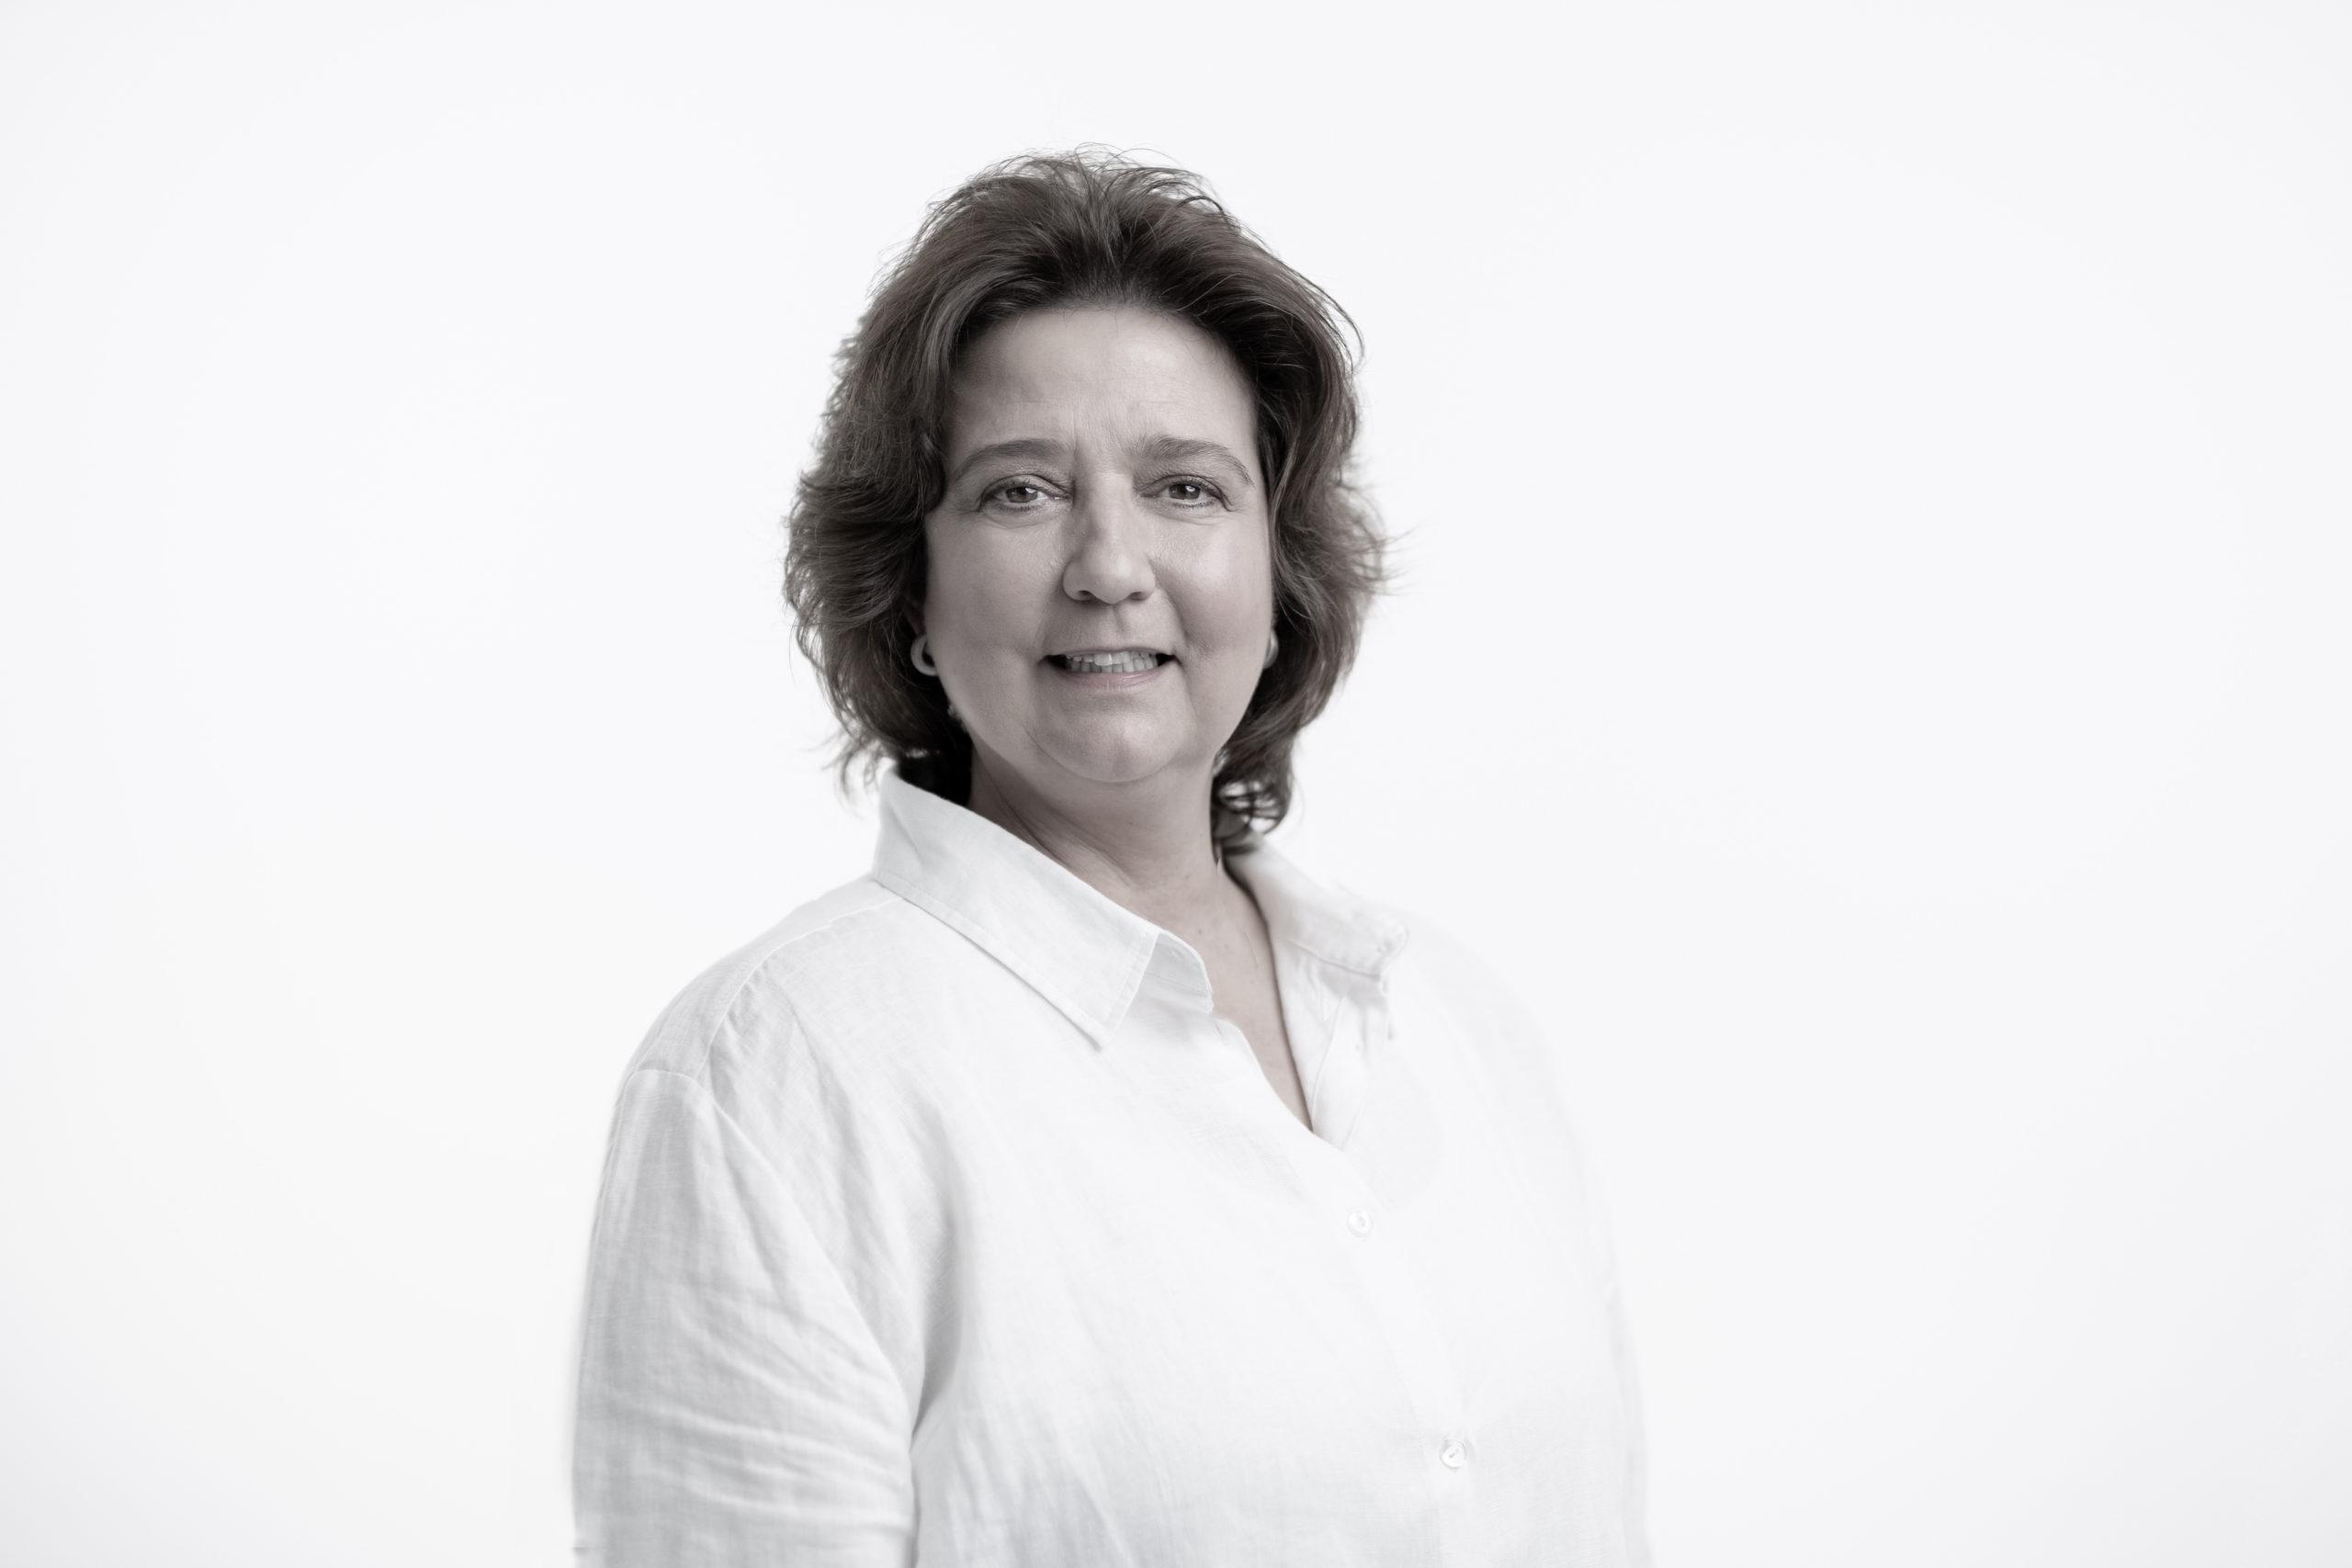 Claudia Jennert